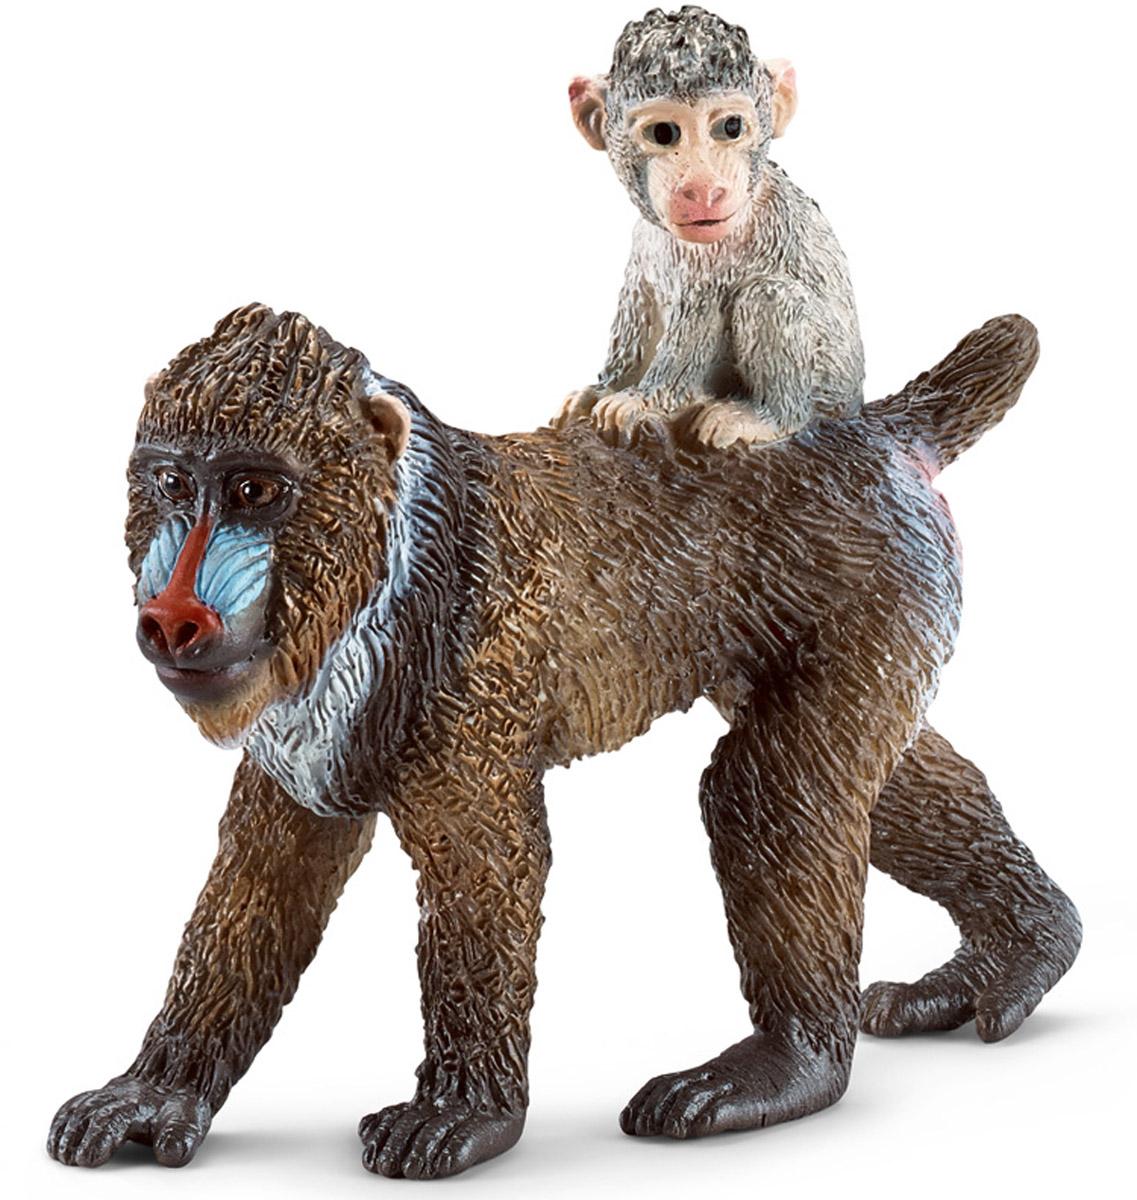 Schleich Фигурка Самка мандрила с детенышем фигурки игрушки schleich шимпанзе самка с детенышем